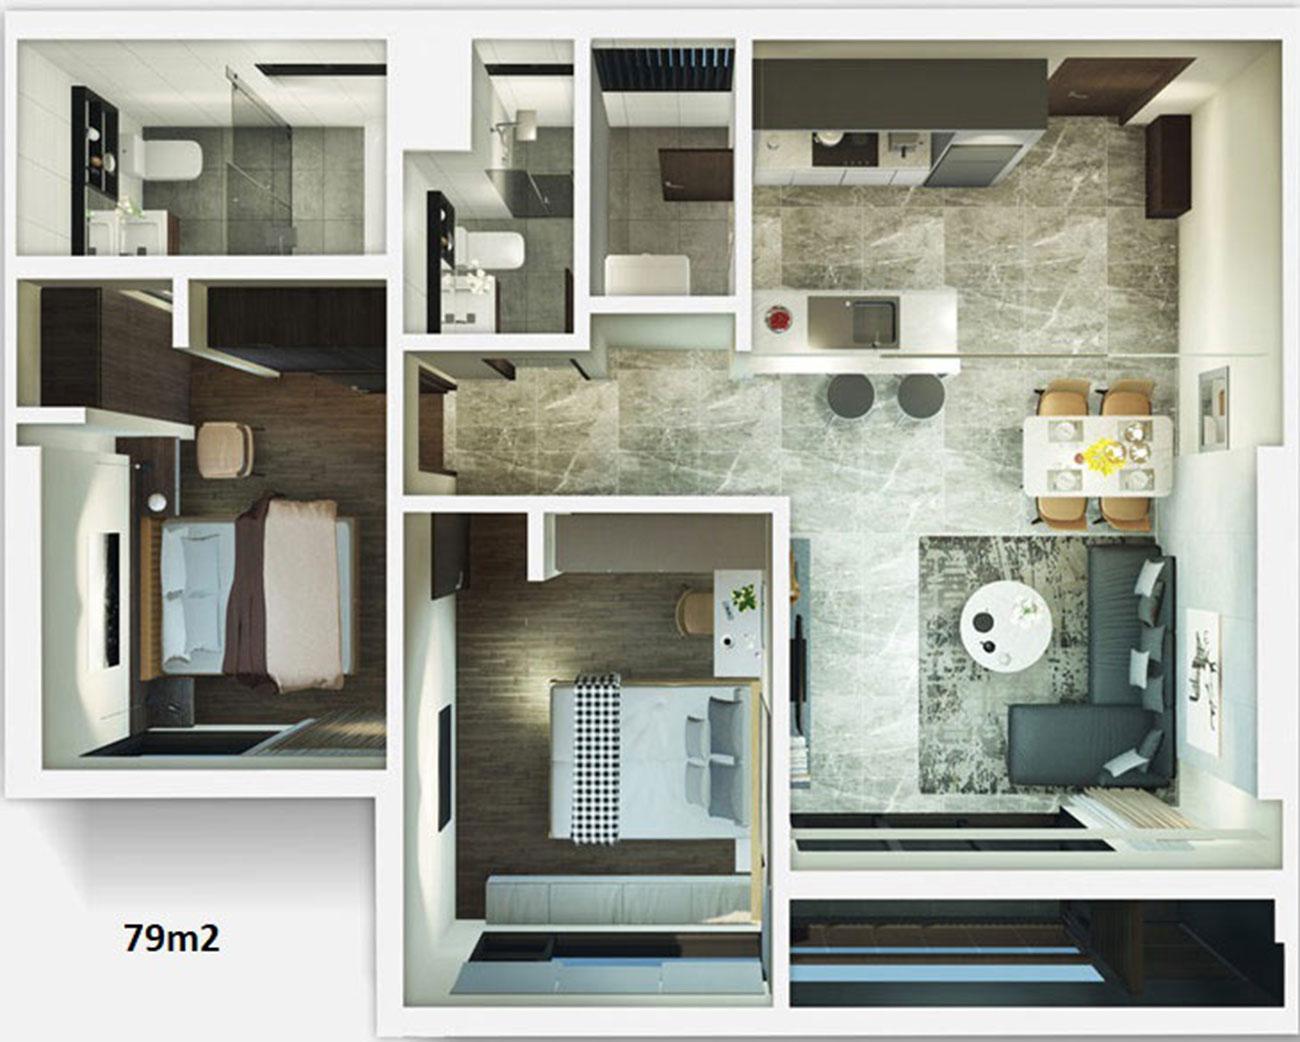 Thiết kế chi tiết căn hộ Kingdom 101 diện tích 79 m2